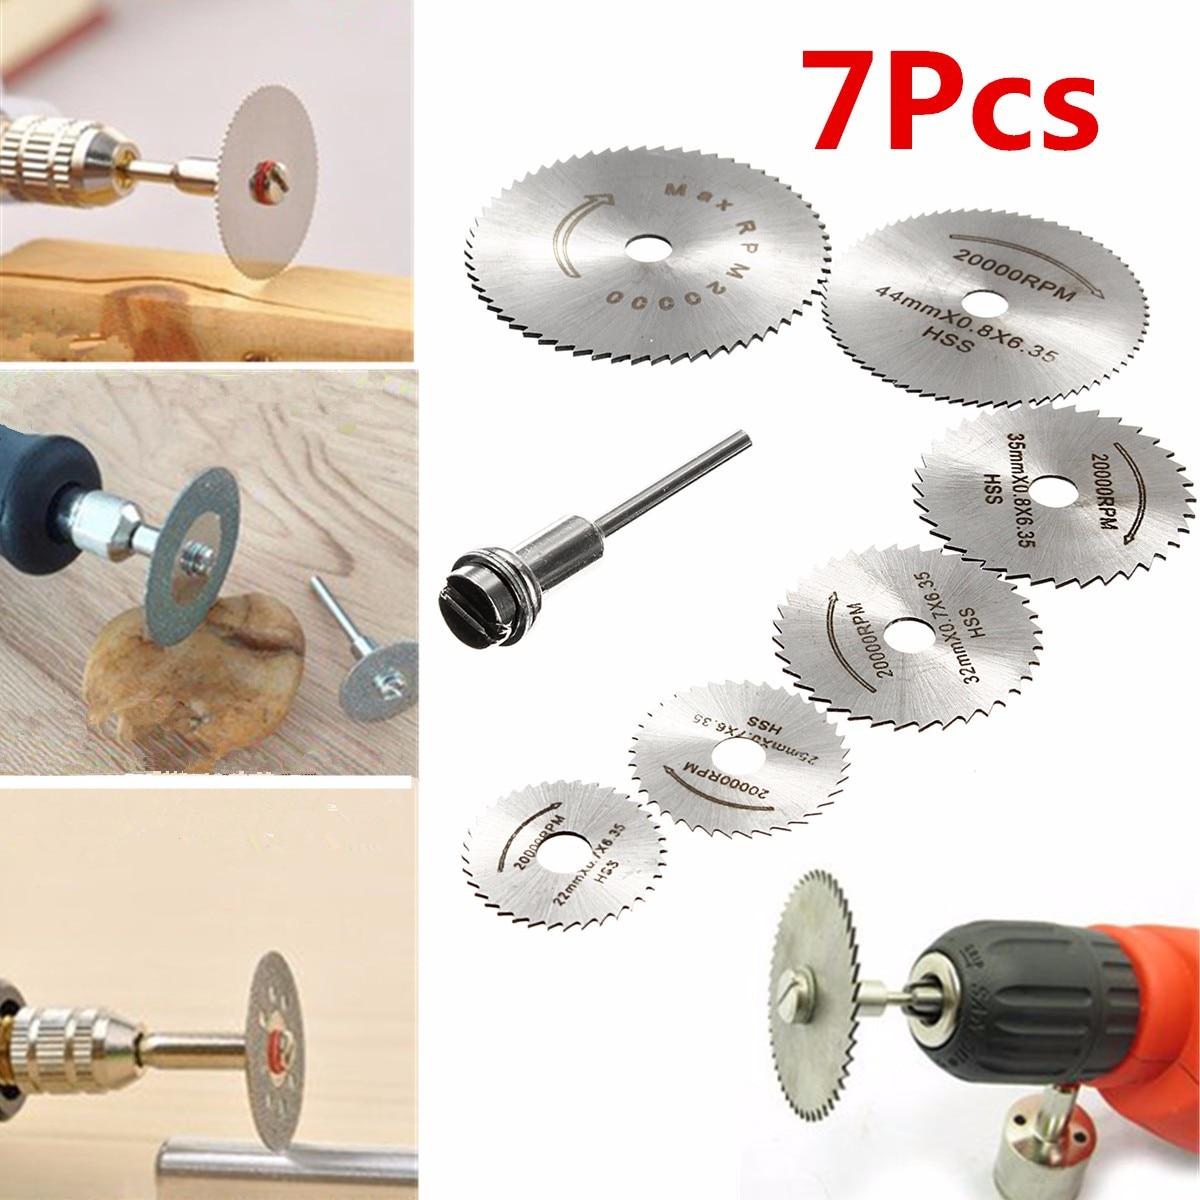 7Pcs HSS Circular Saw Blade + 1Pcs HSS Circular Rotary Blade Wheel Discs Mandrel For Wood Cutting Saws Tool Accessories Kit